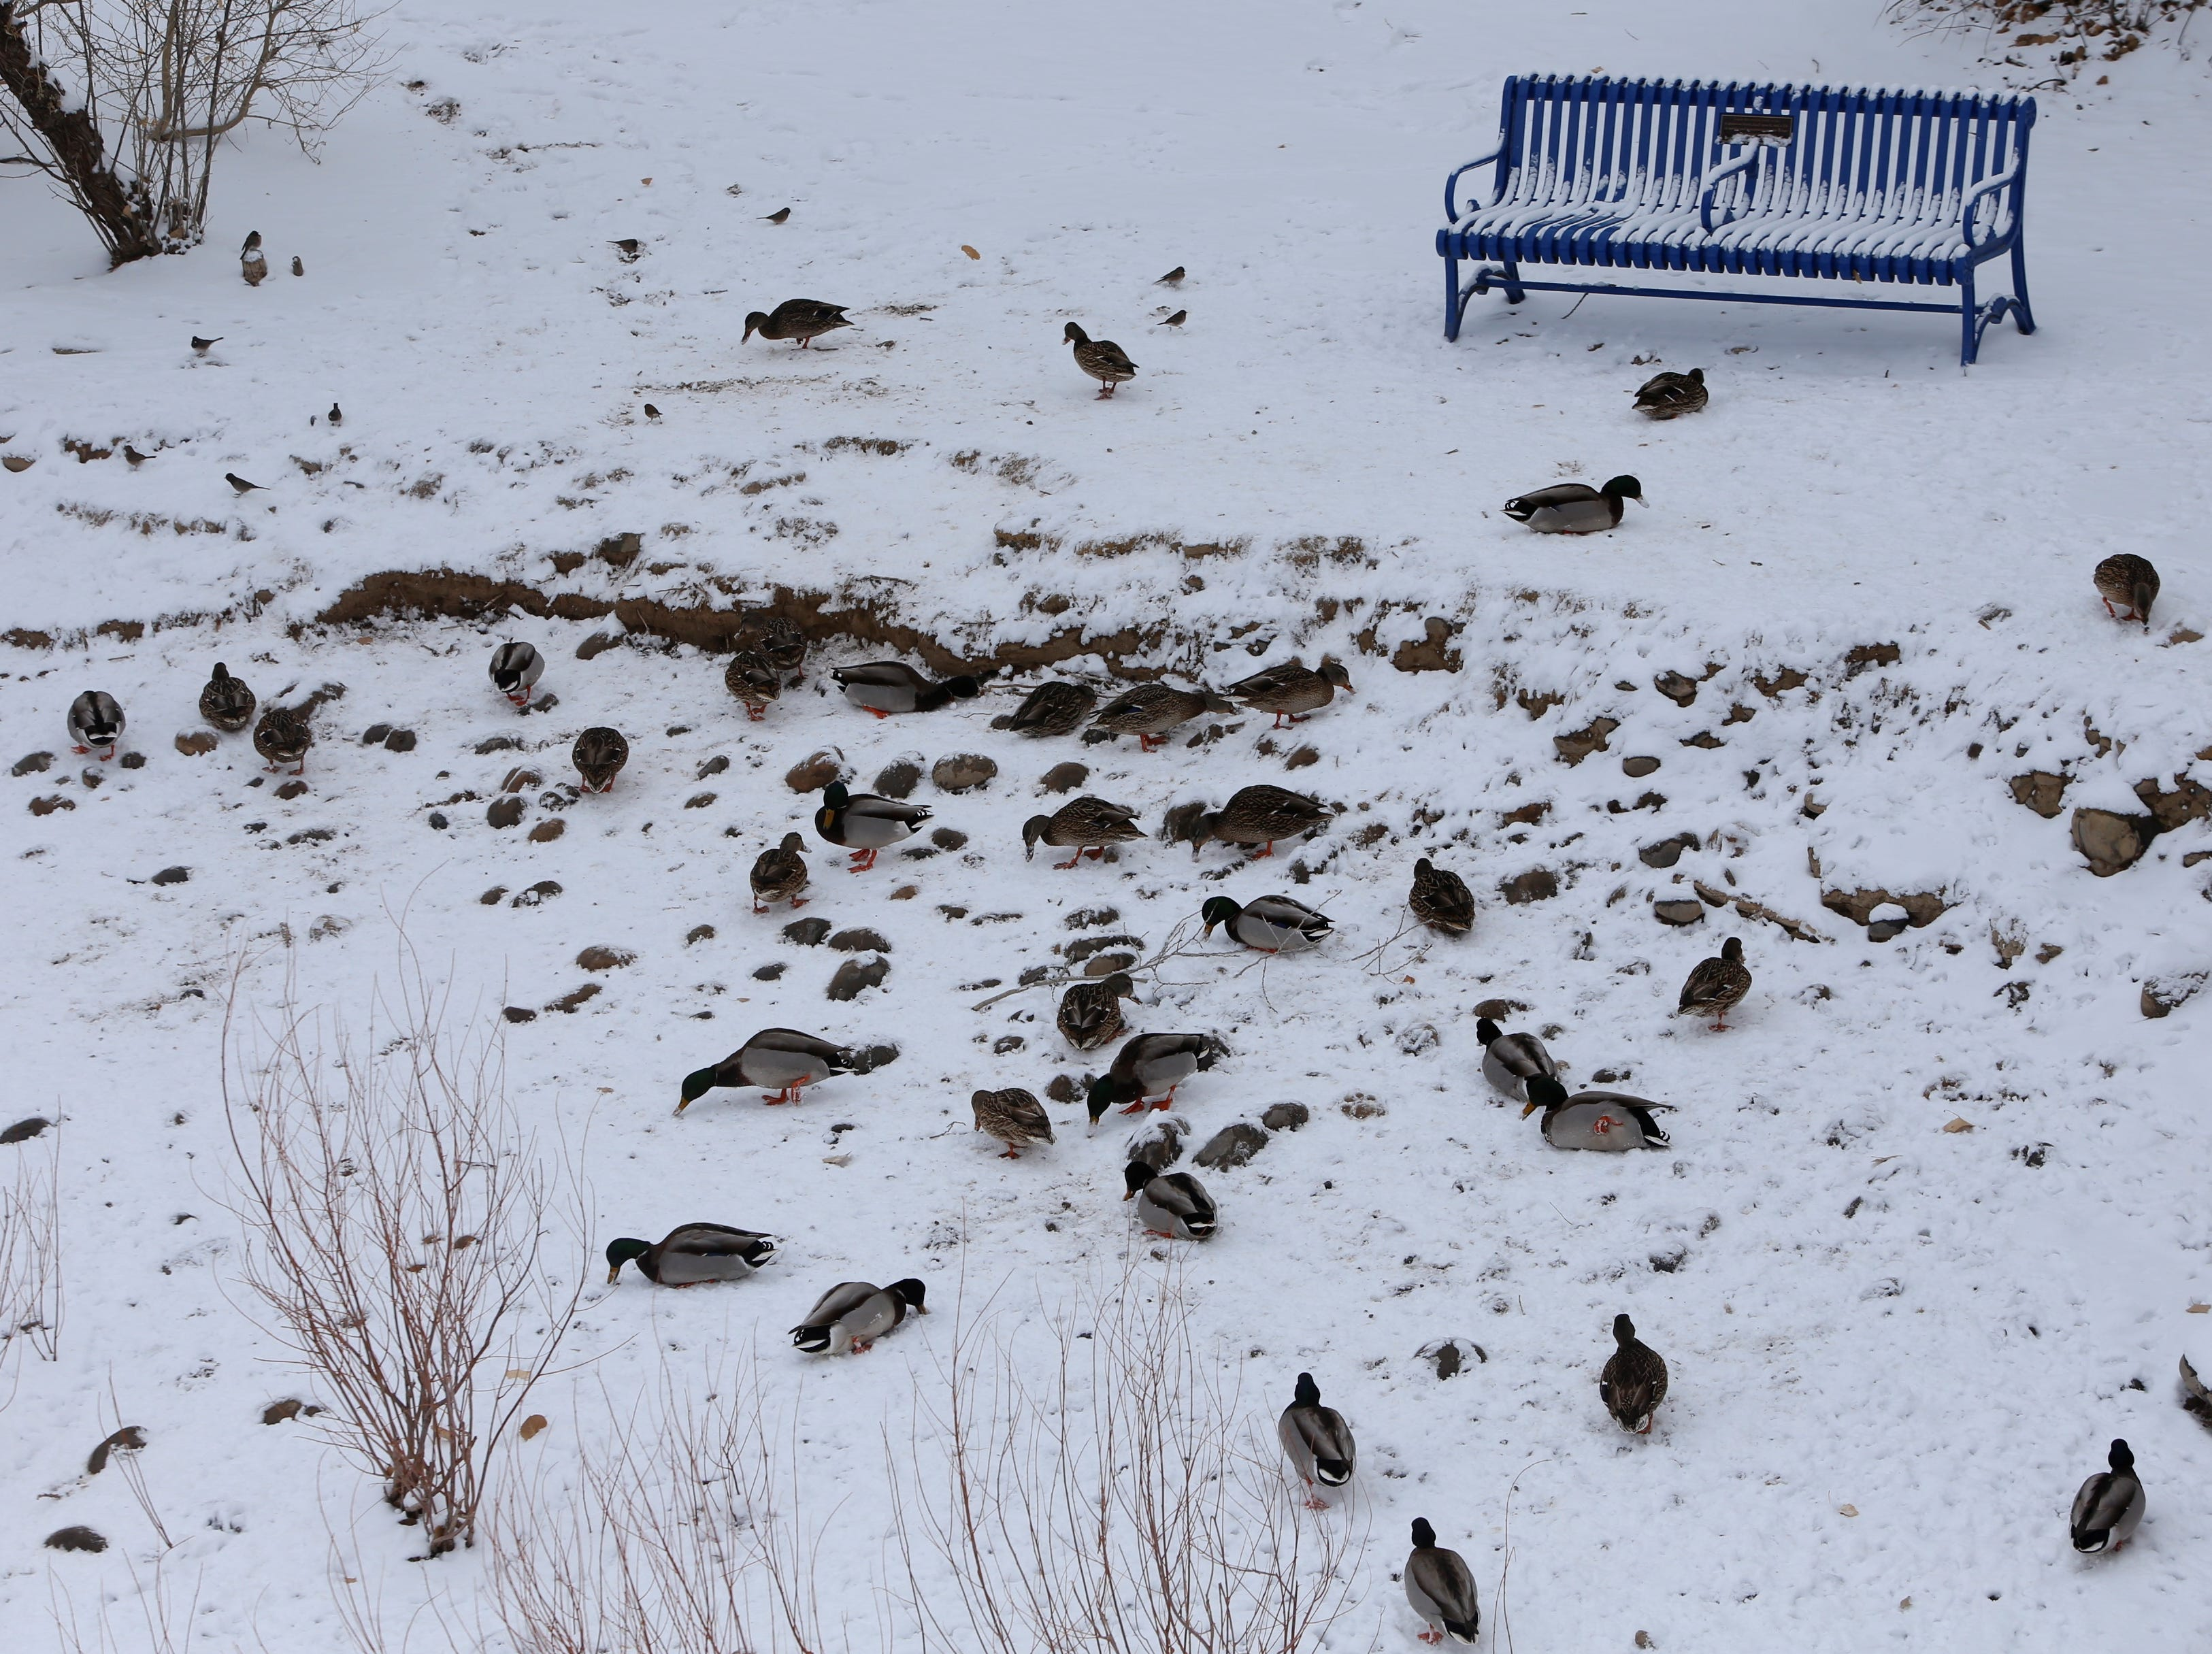 Ducks enjoy the snow near the Berg Bridge in Berg Park on Friday.